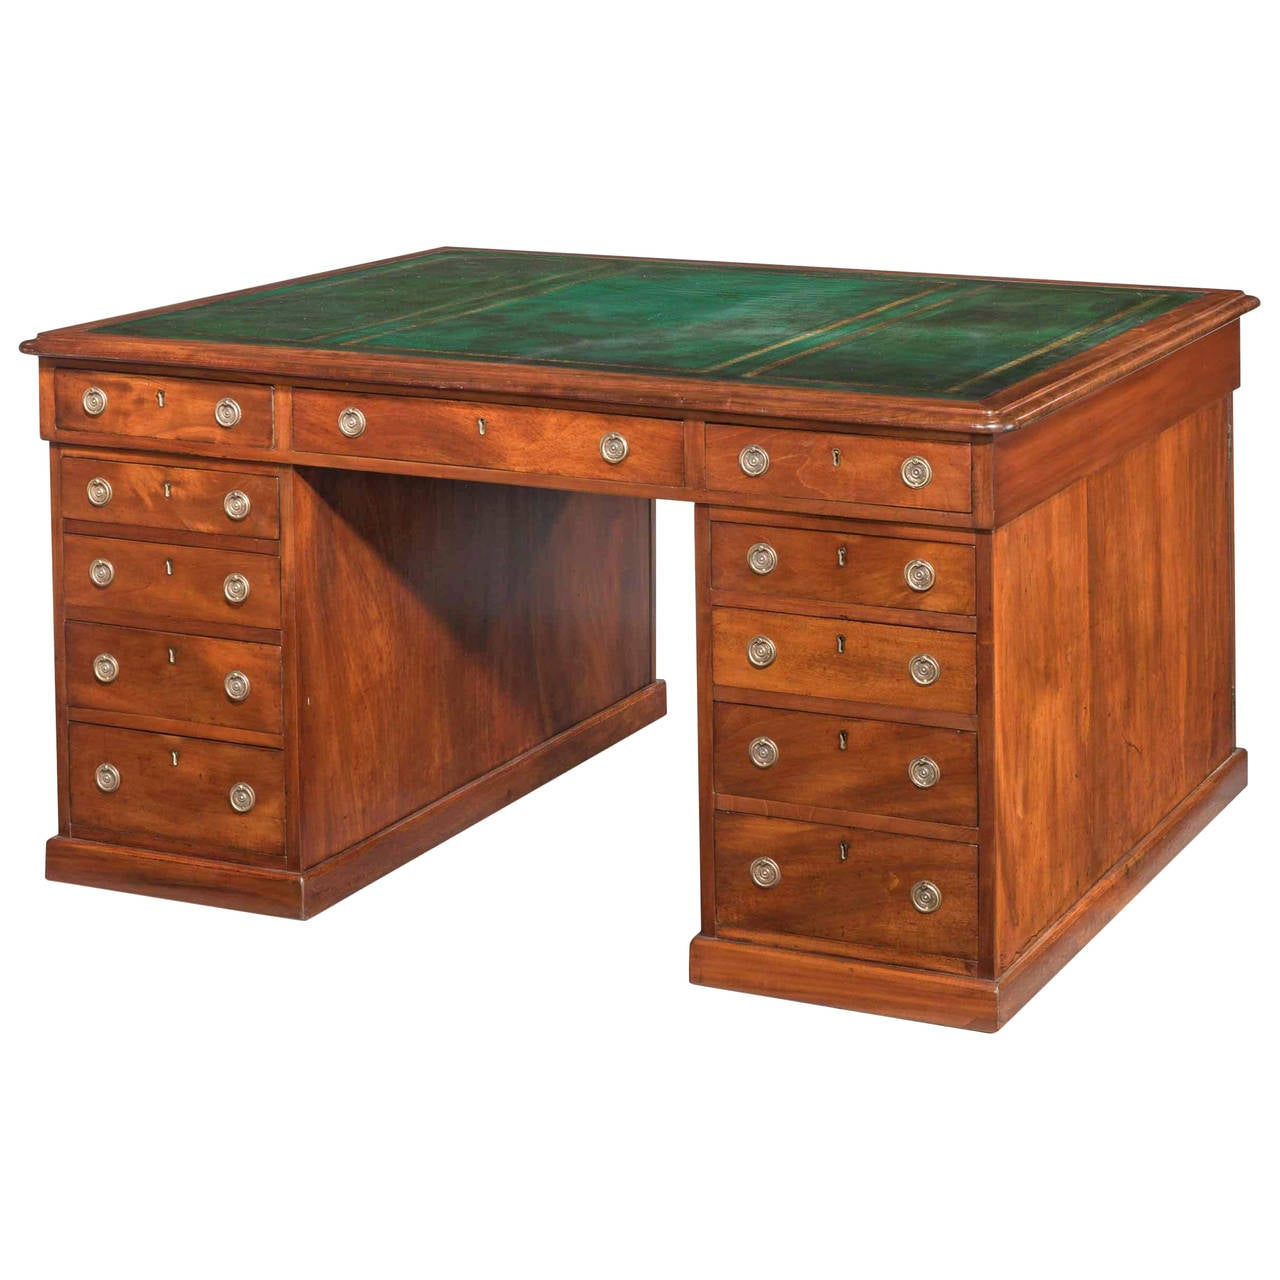 Late Regency Period Mahogany Three-Part Pedestal Desk